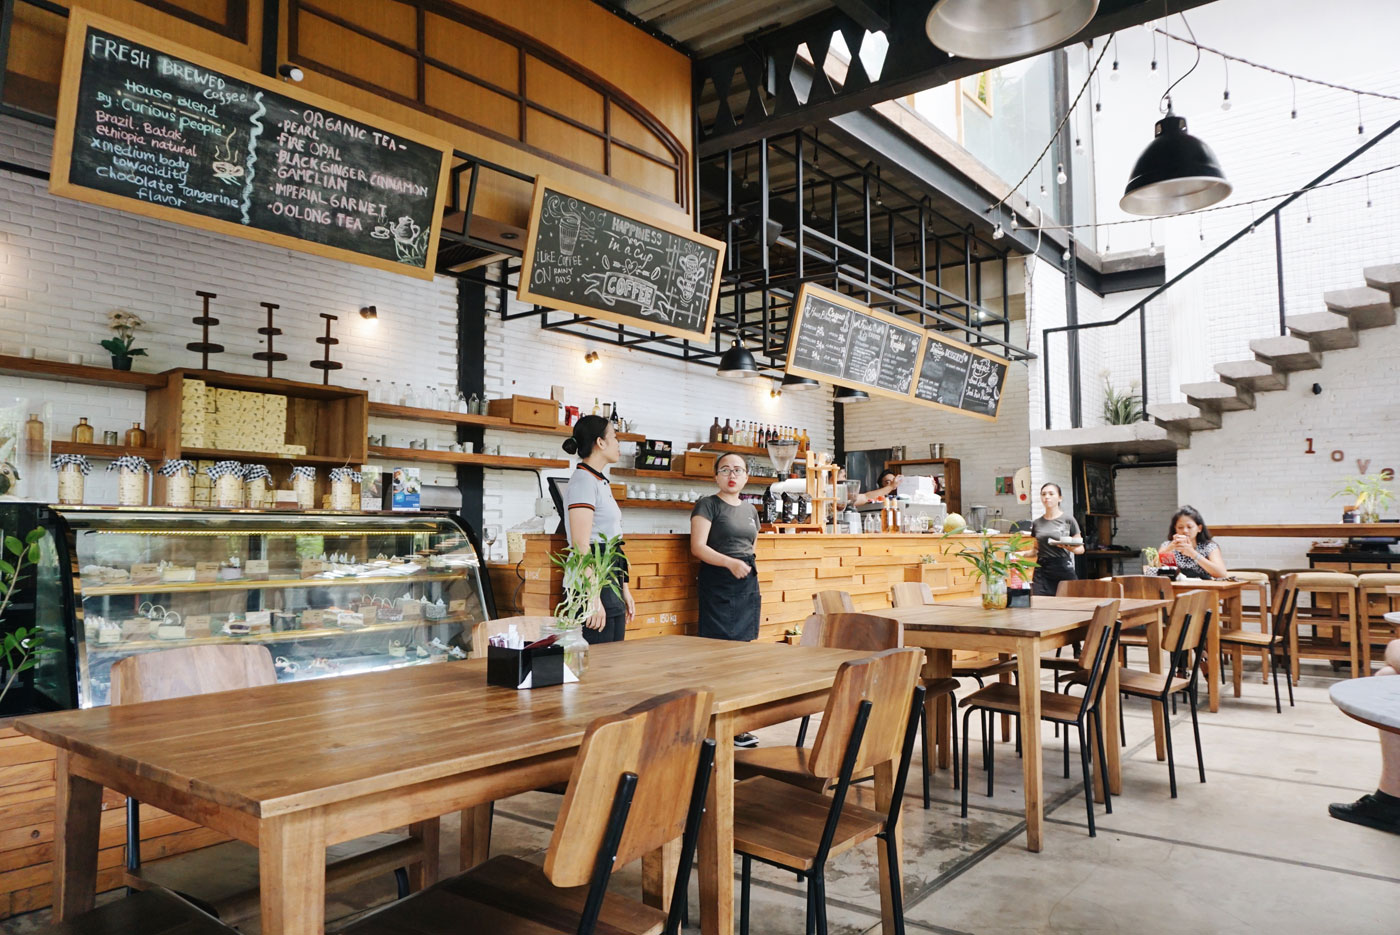 Livingstone Cafe & Bakery, Bali